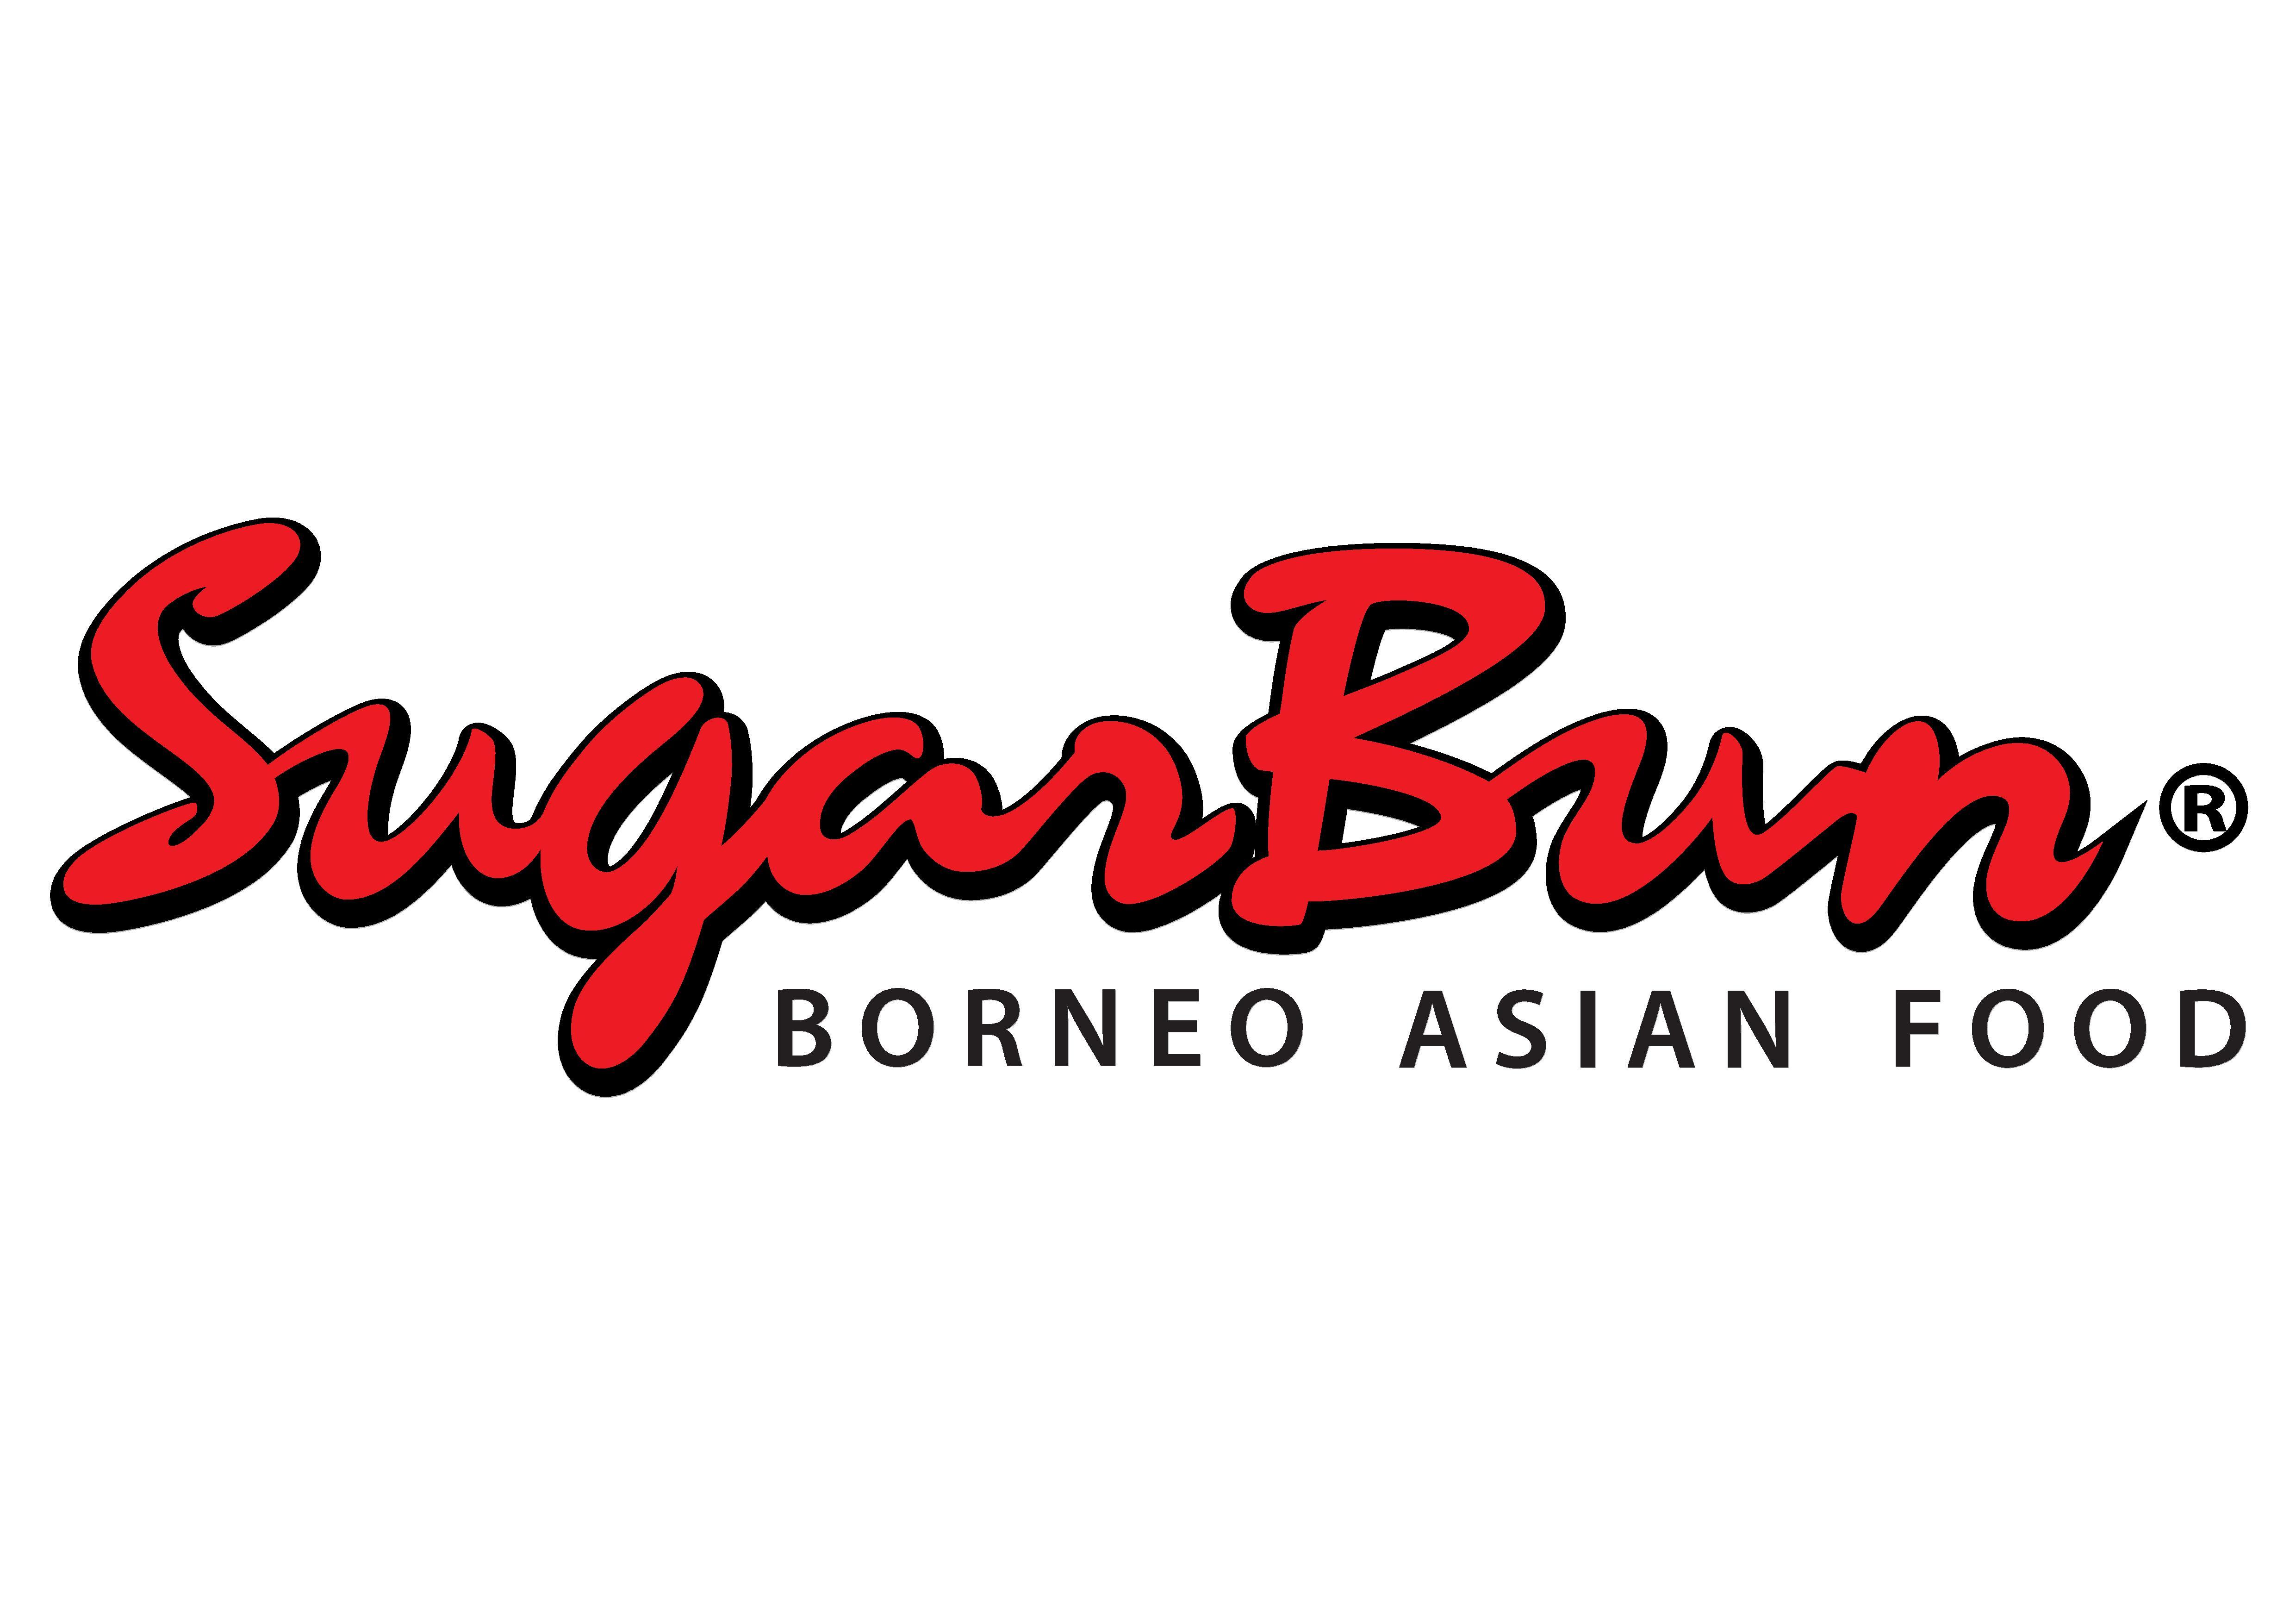 jobs in Sugarbun Borneo Asian Food